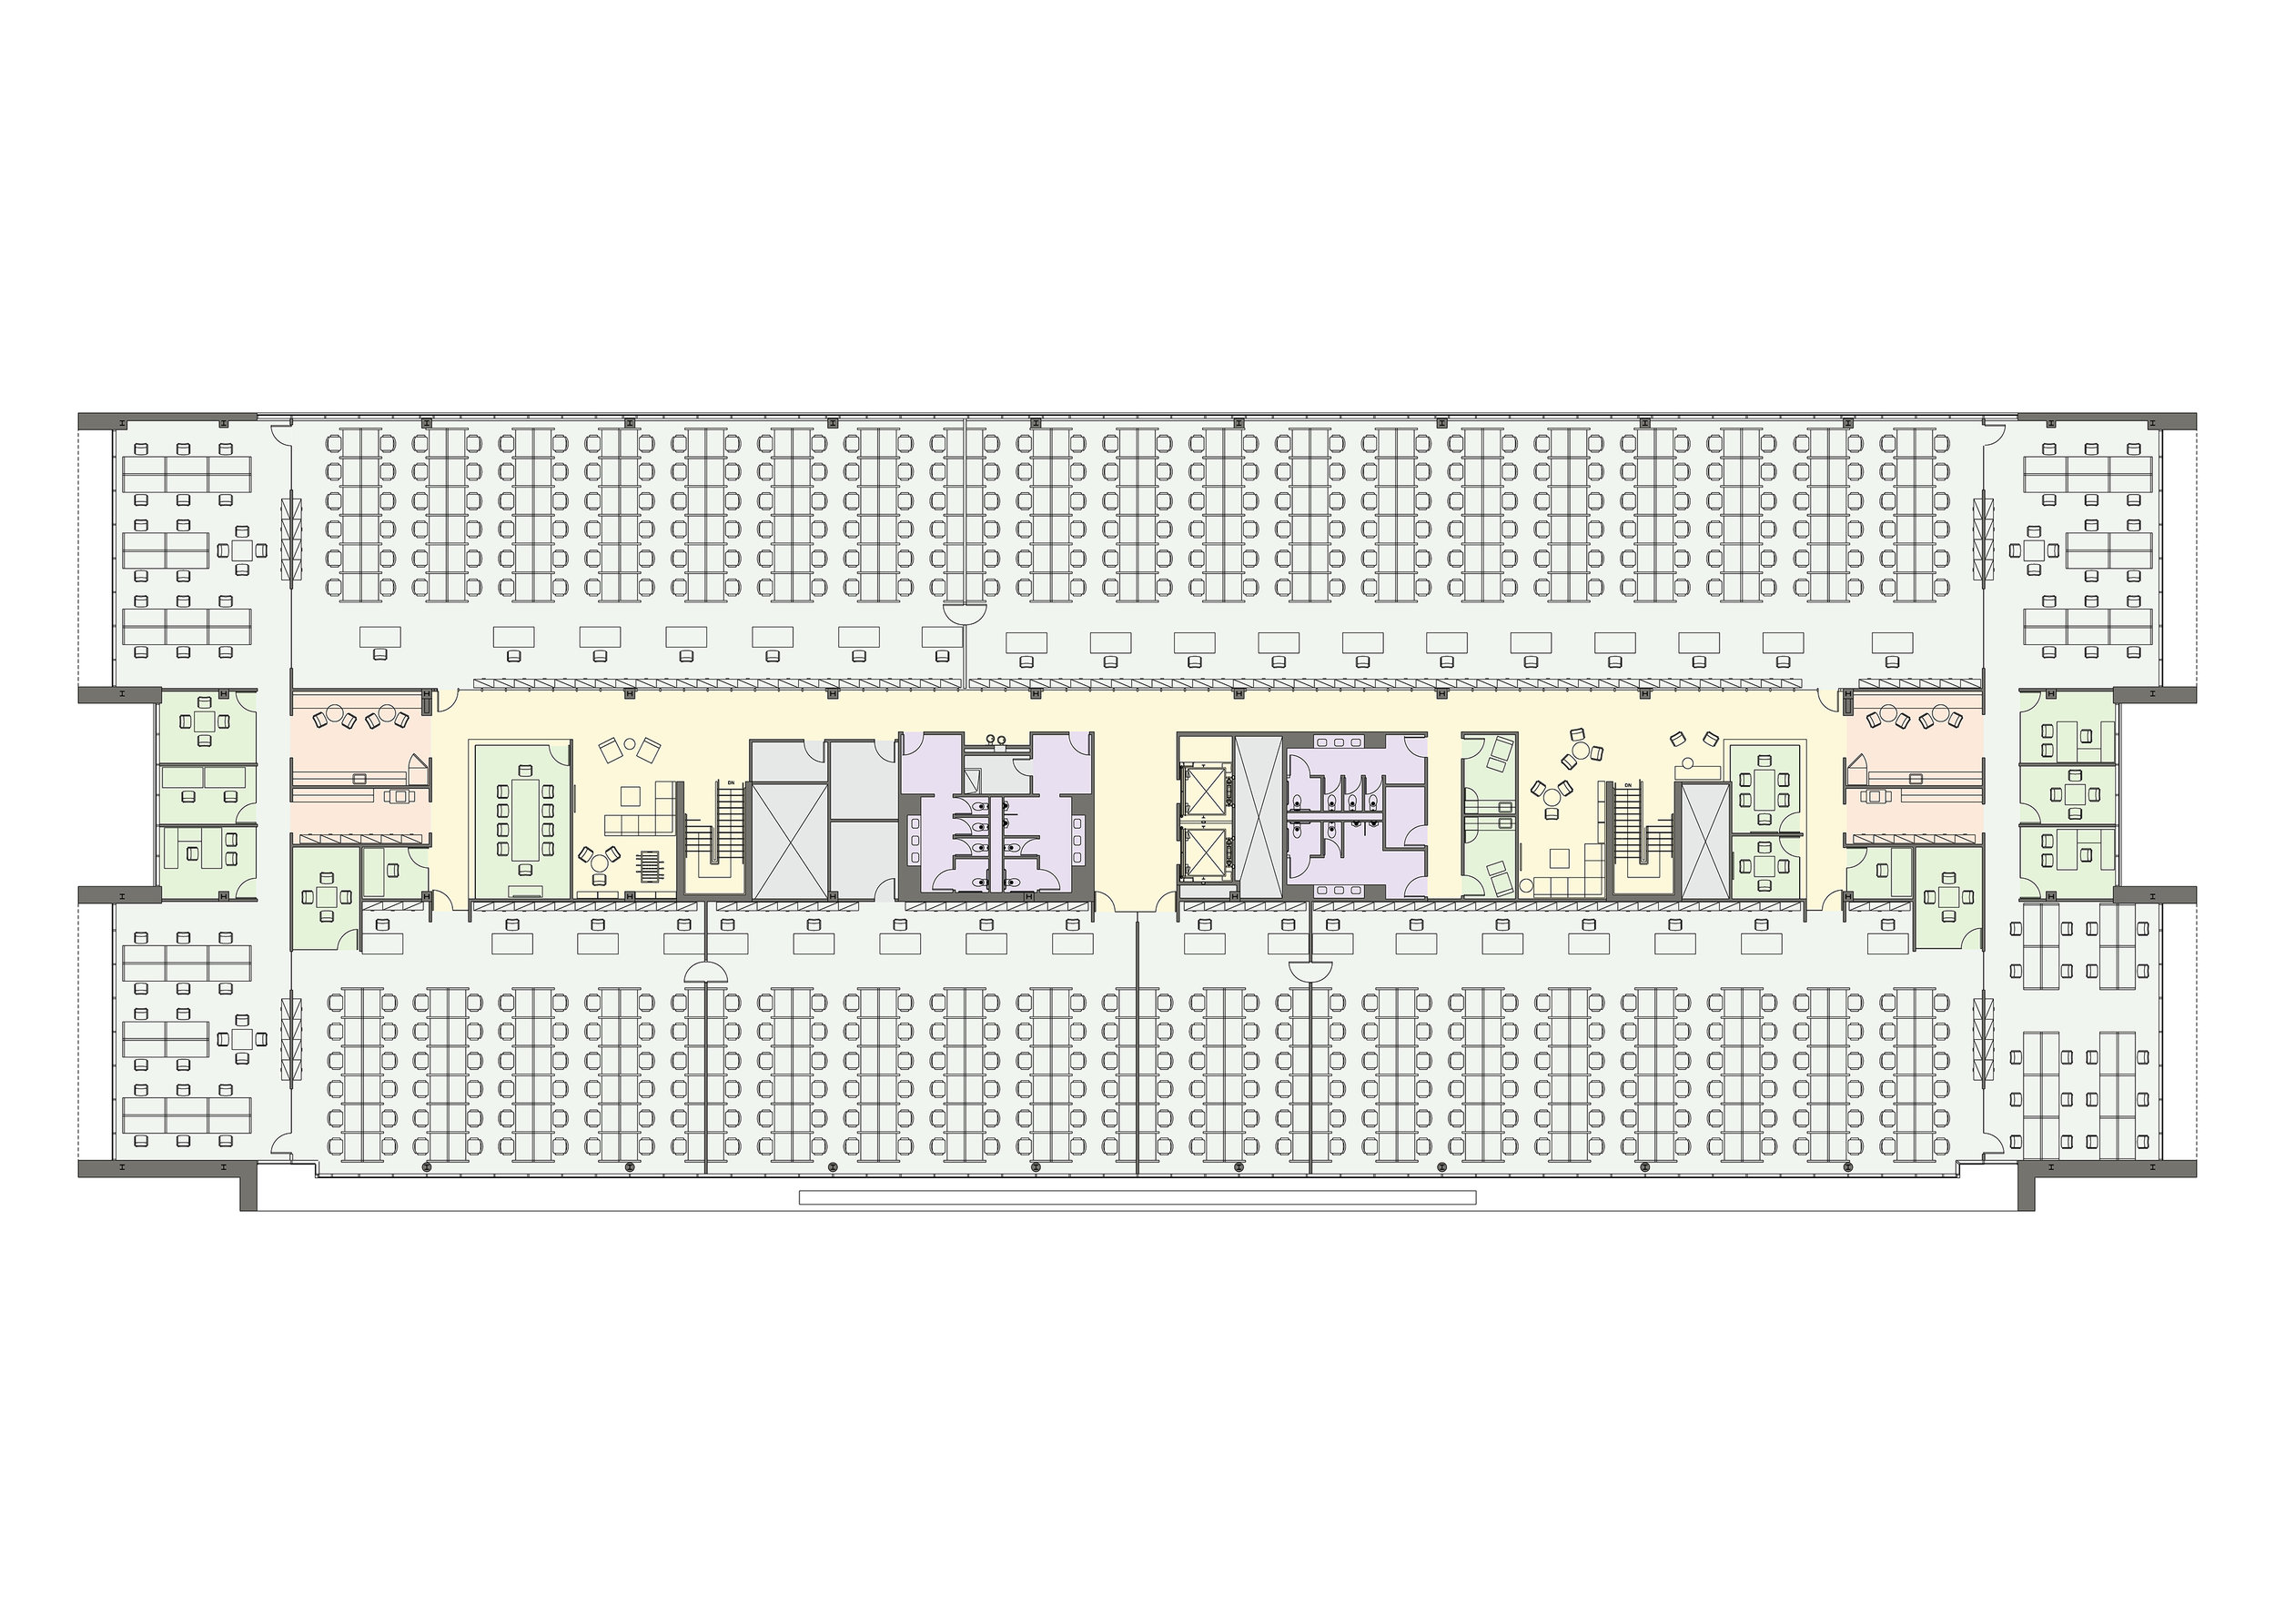 Typical Call Center Floor Plan